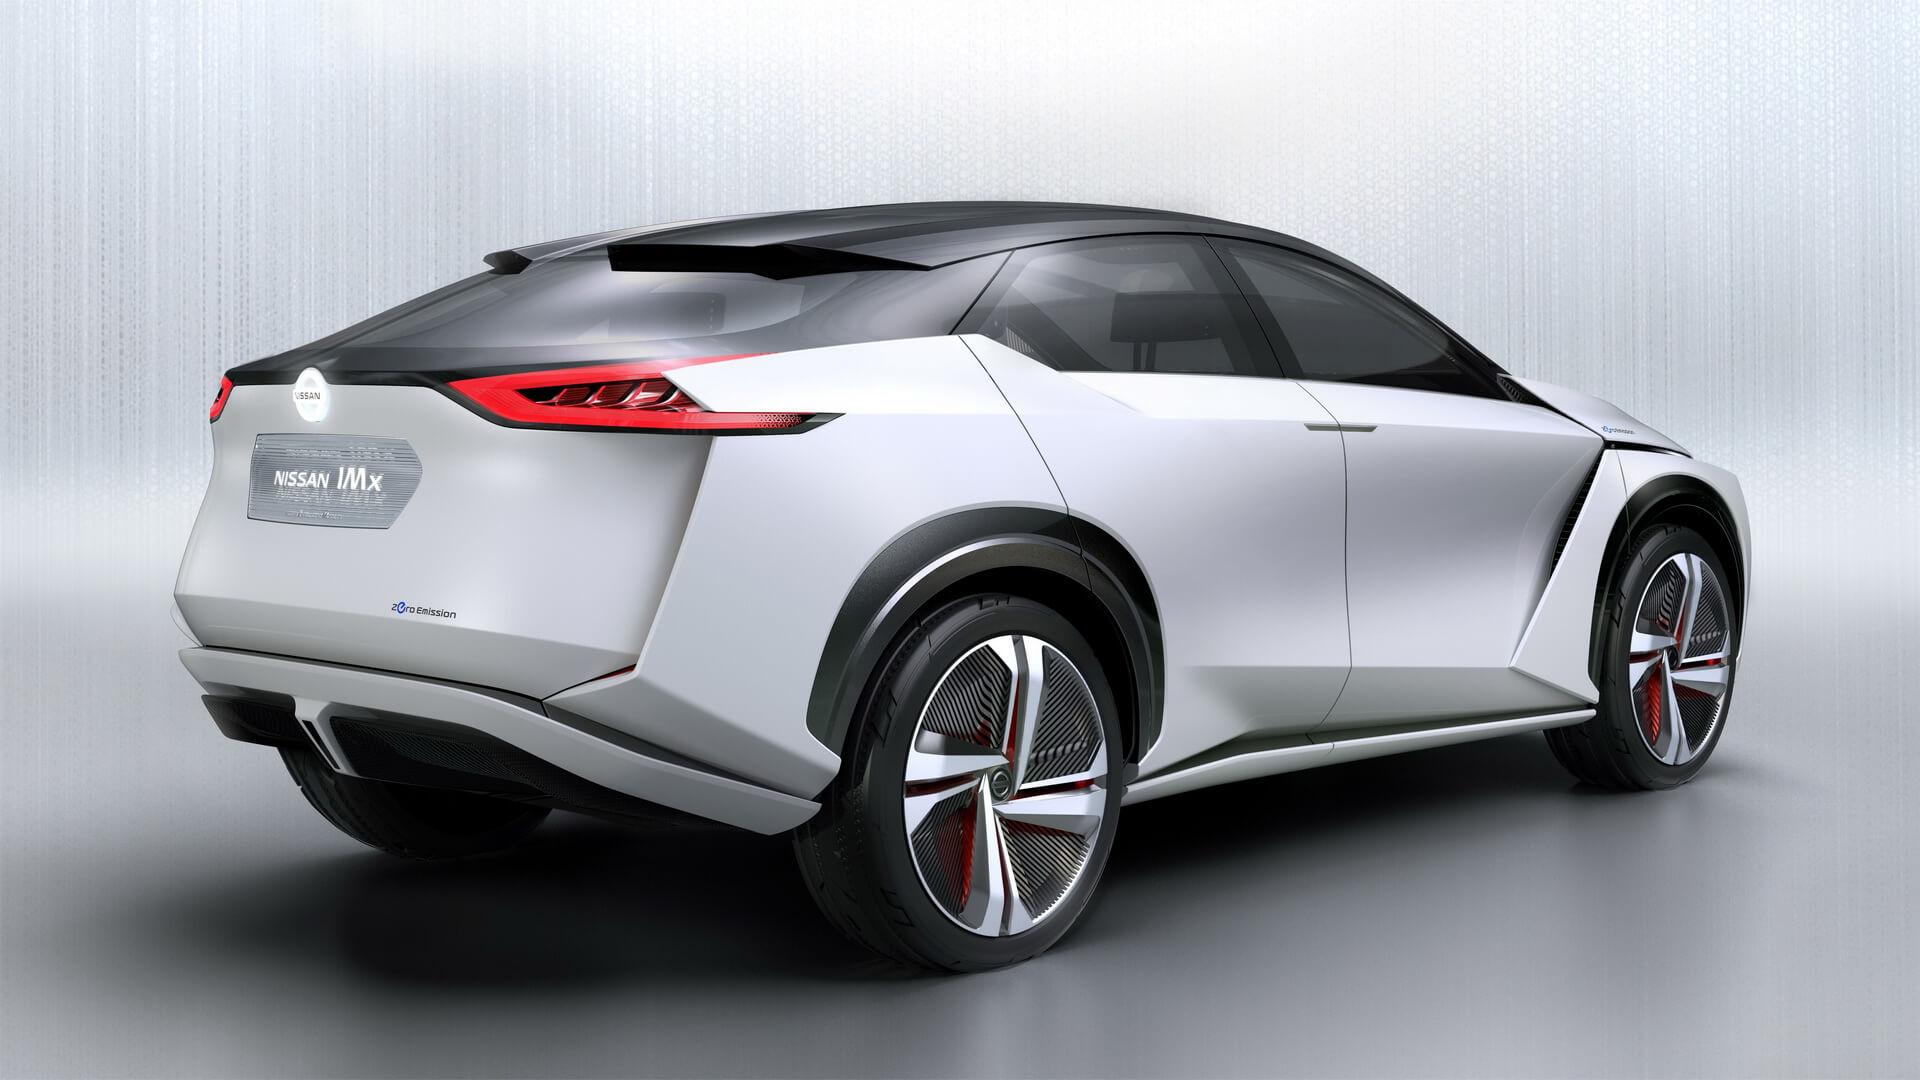 Дизайн кроссовера Nissan IMx